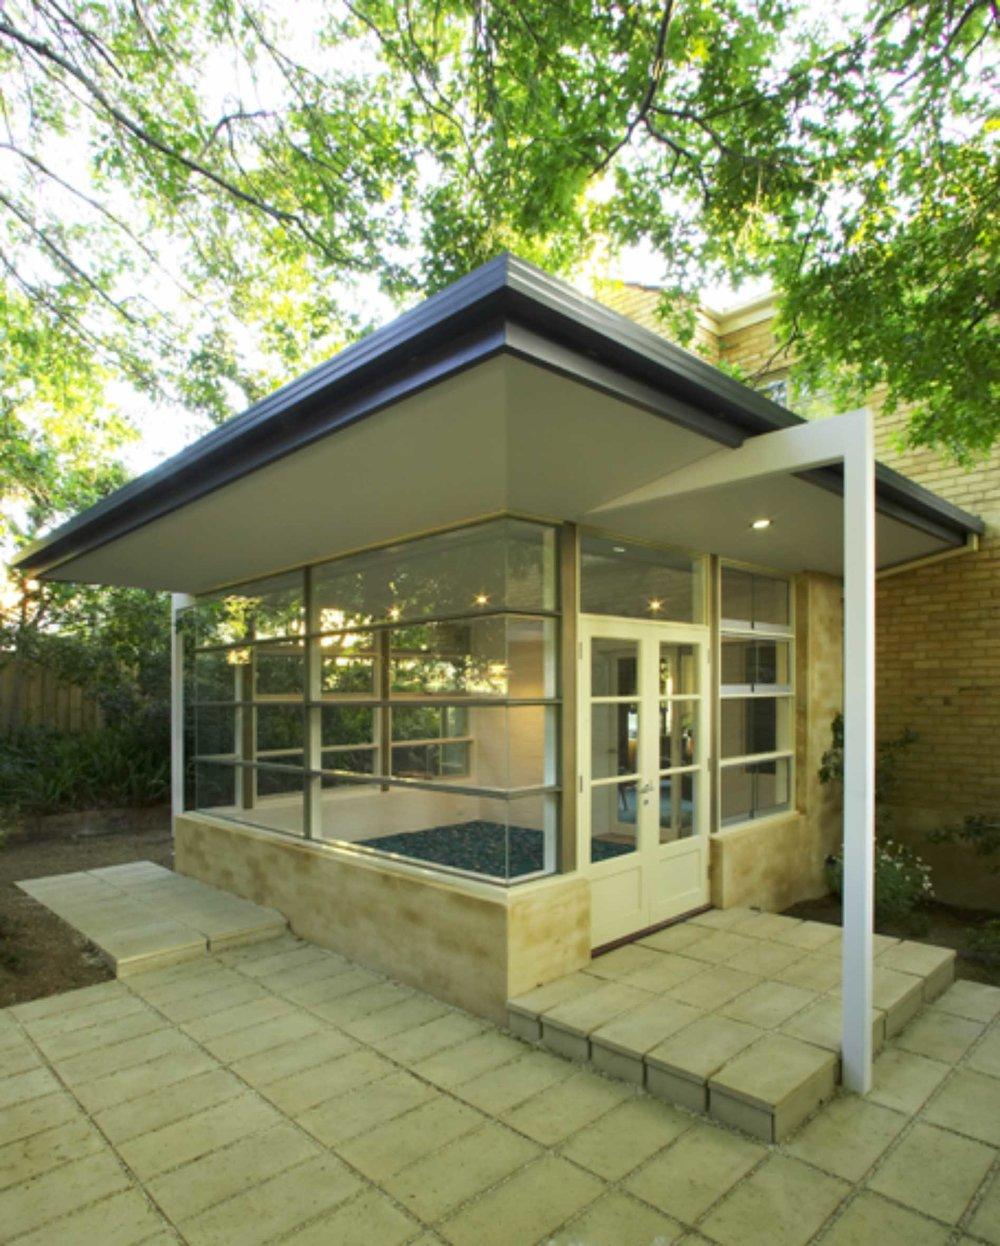 Kew Sunroom Pic 1.jpg